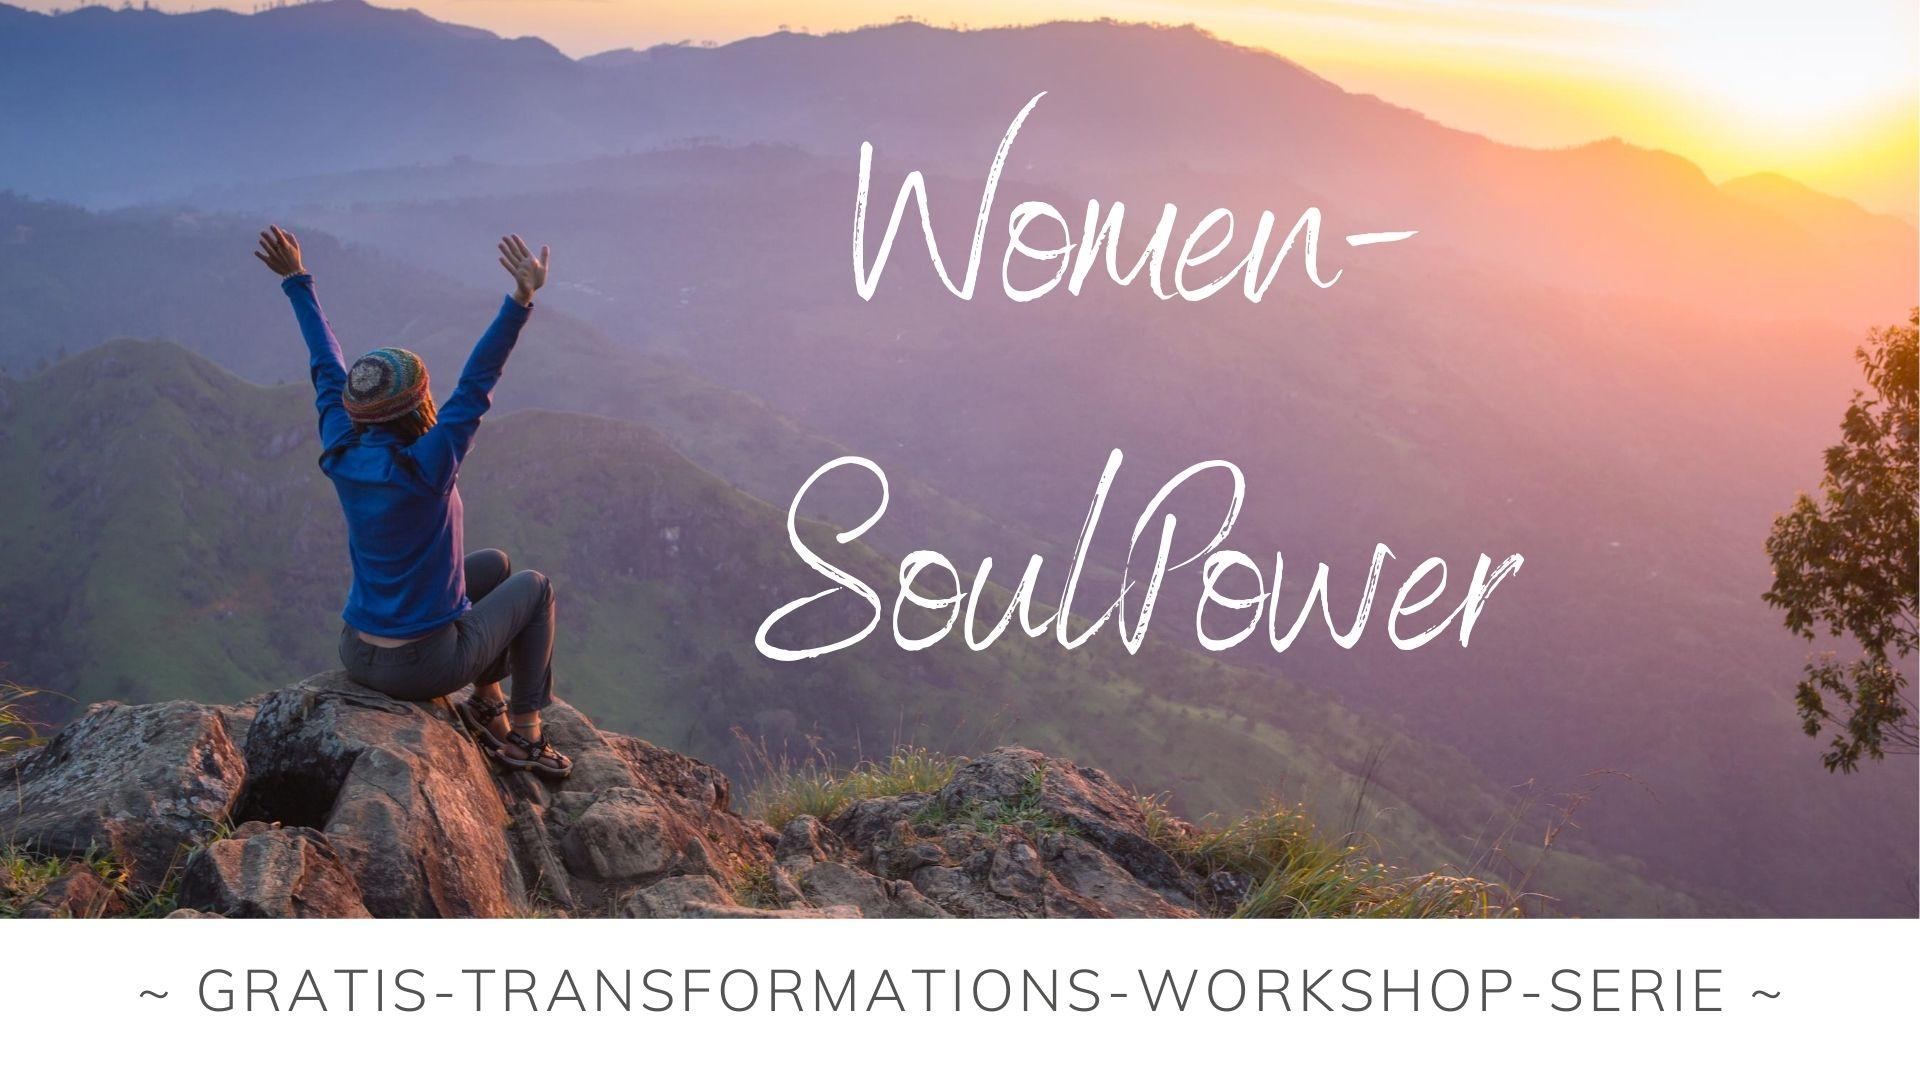 Women SoulPower Transformations-Workshop-Serie Banner